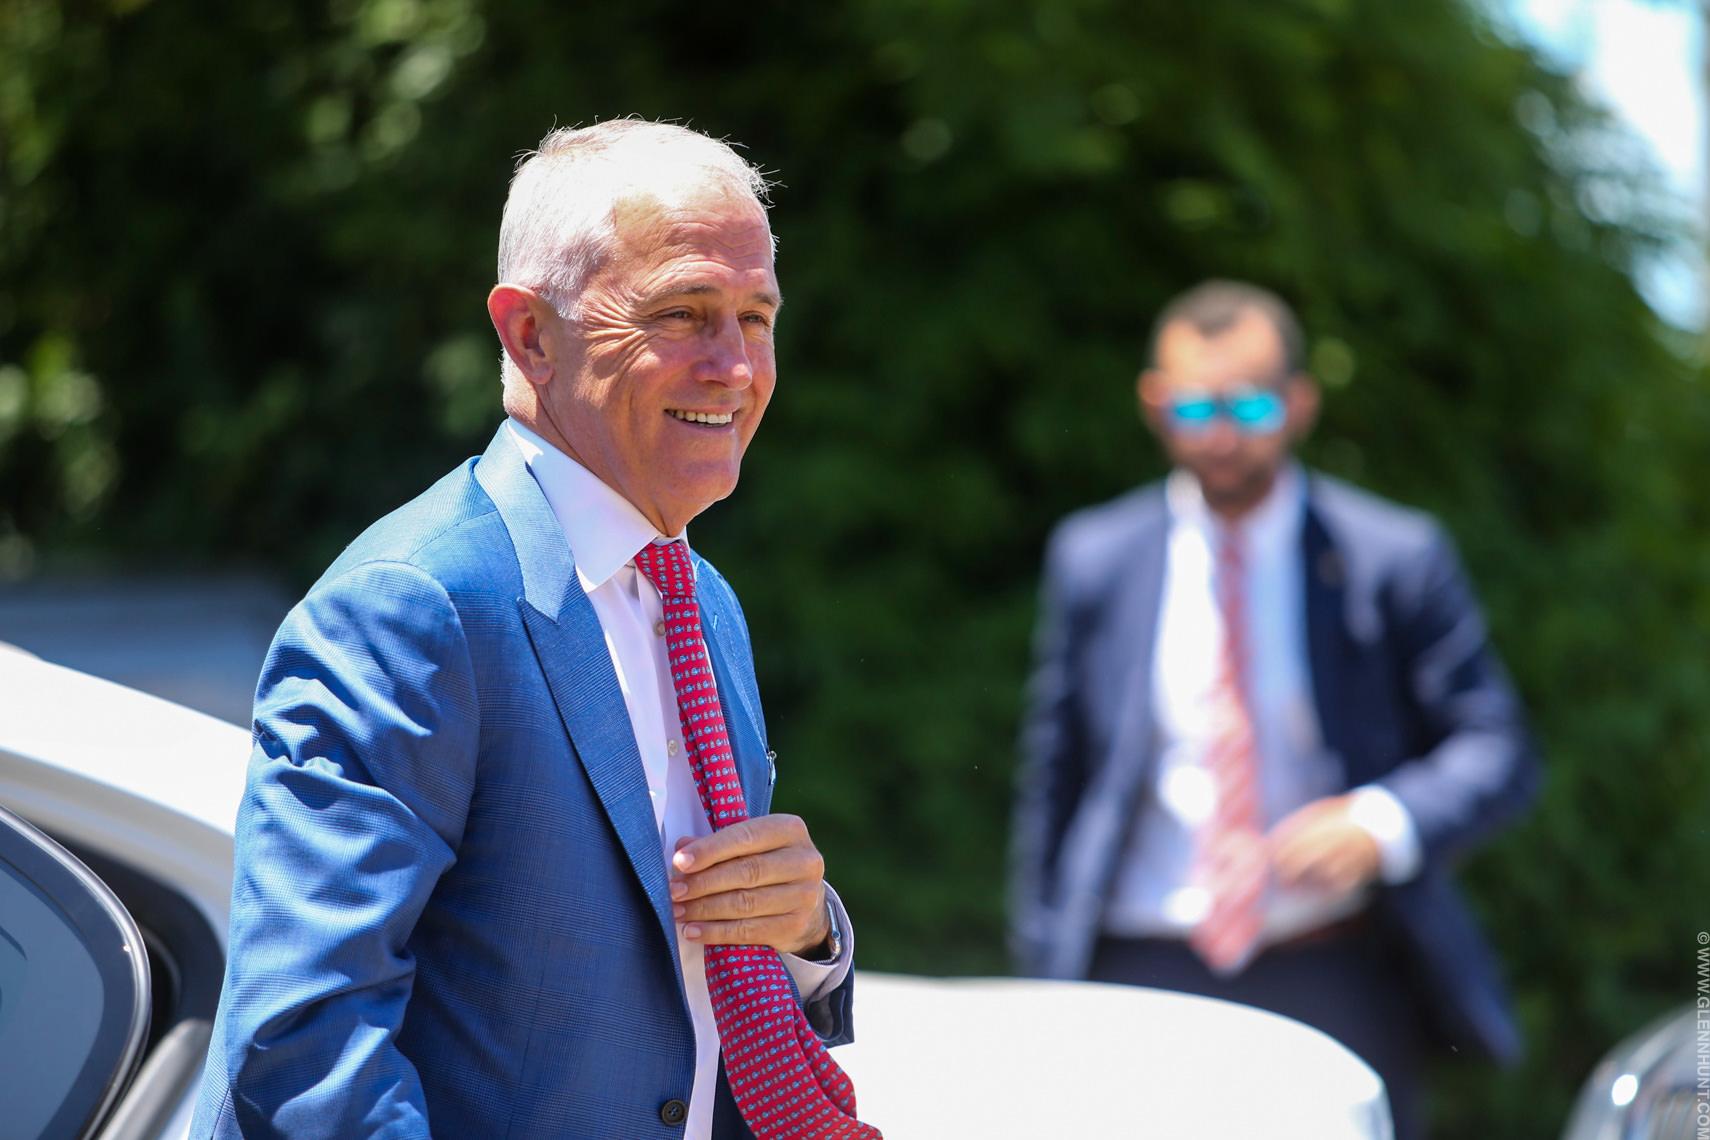 Malcolm Turnbull michaelia cash